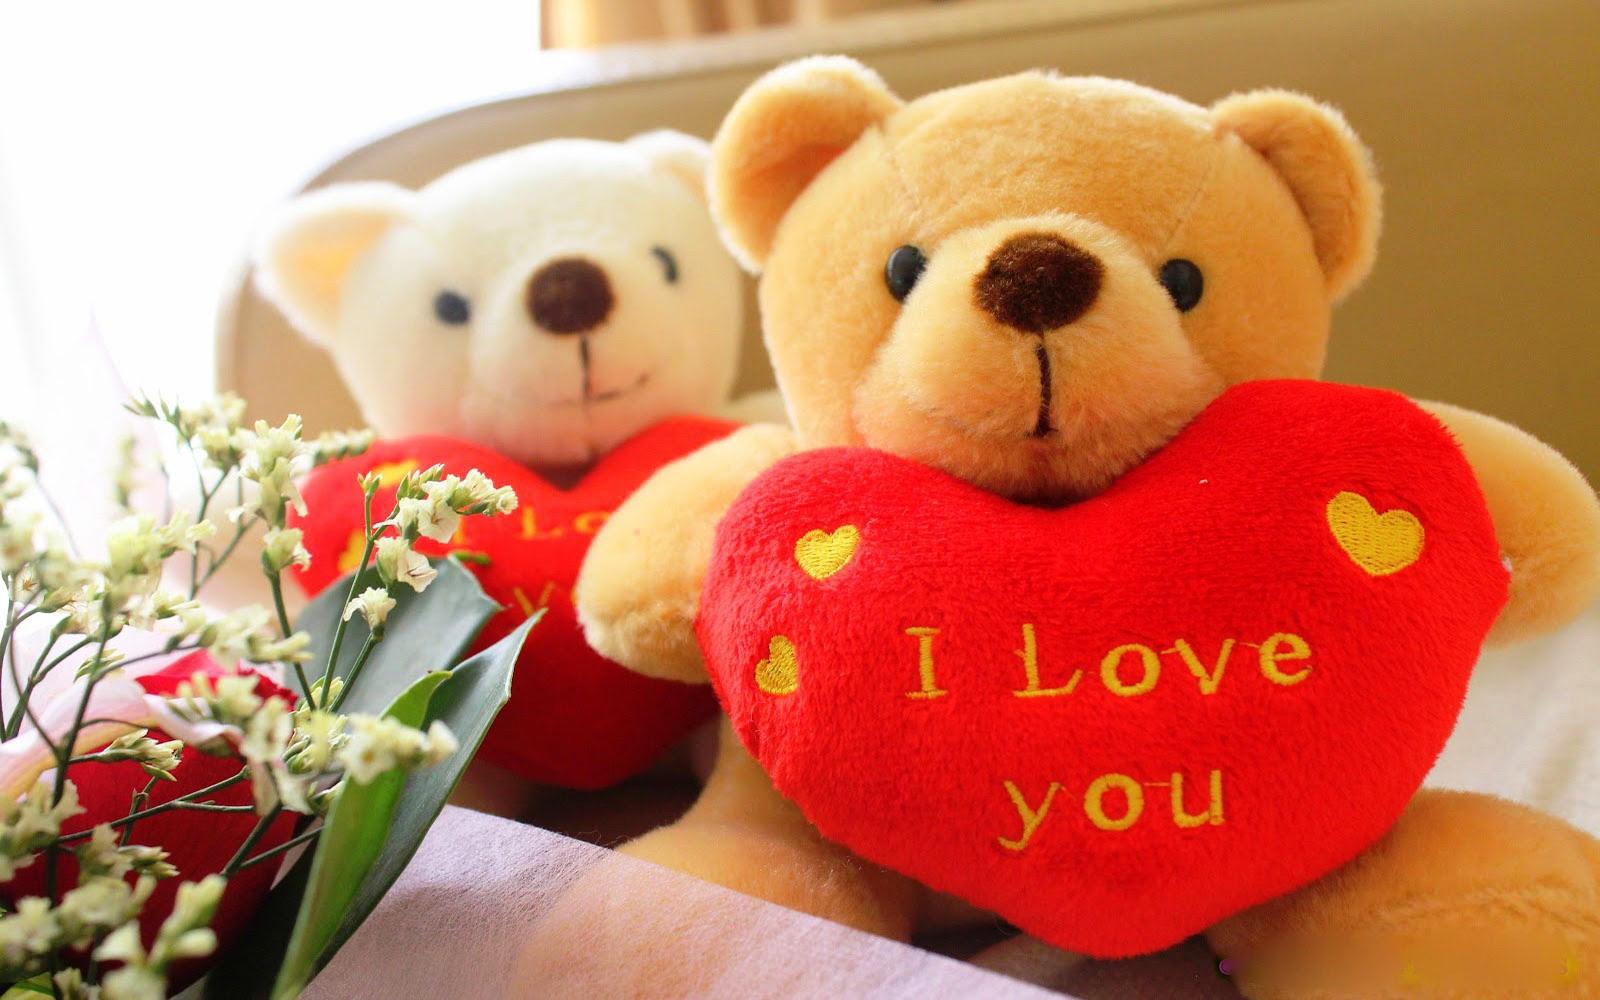 Download Wallpaper Toy Teddy Bear Teddy Iphone Hd 1600x1000